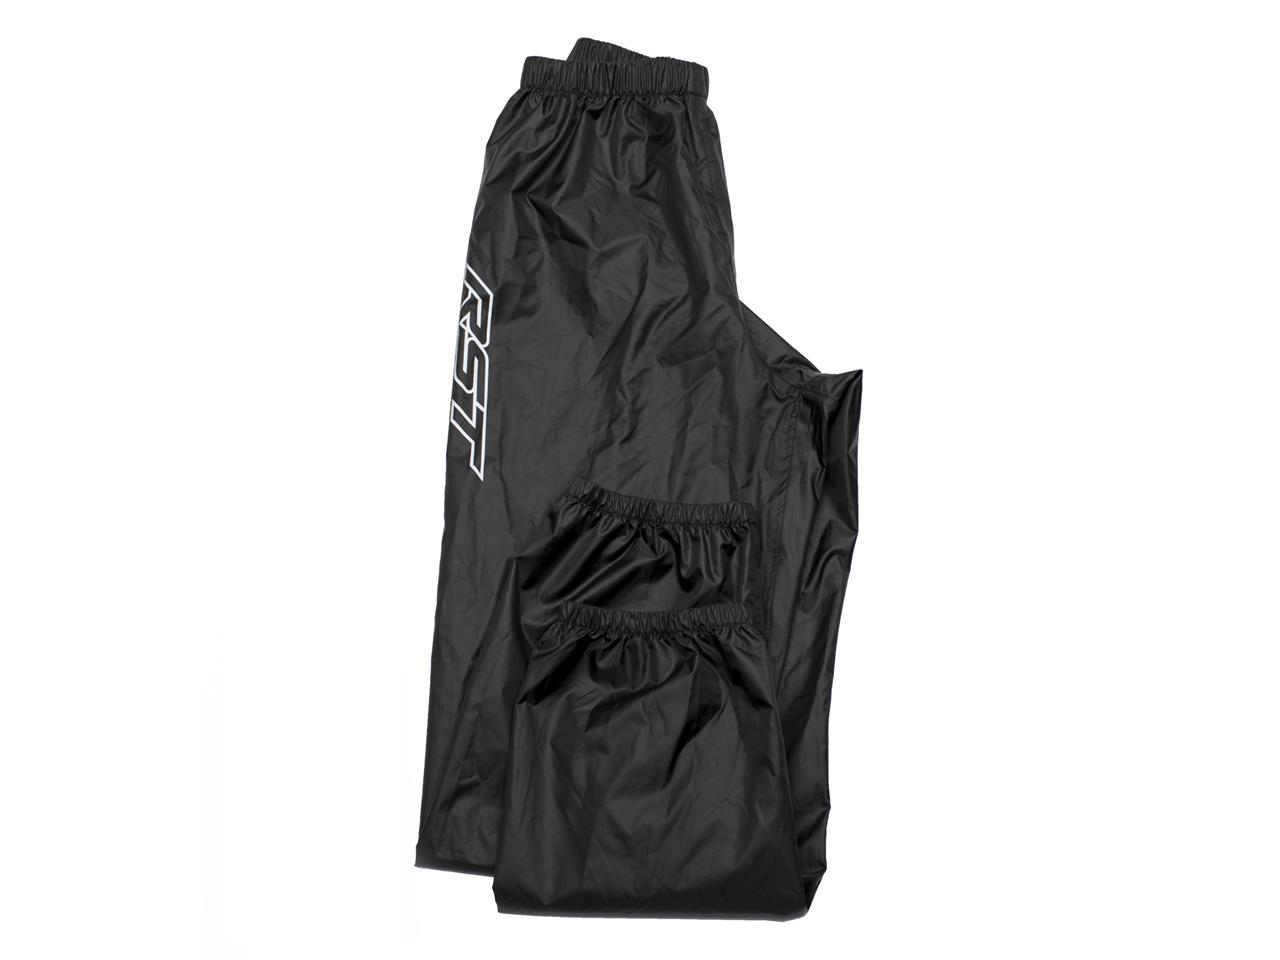 Pantalon pluie RST Lightweight noir taille 2XL